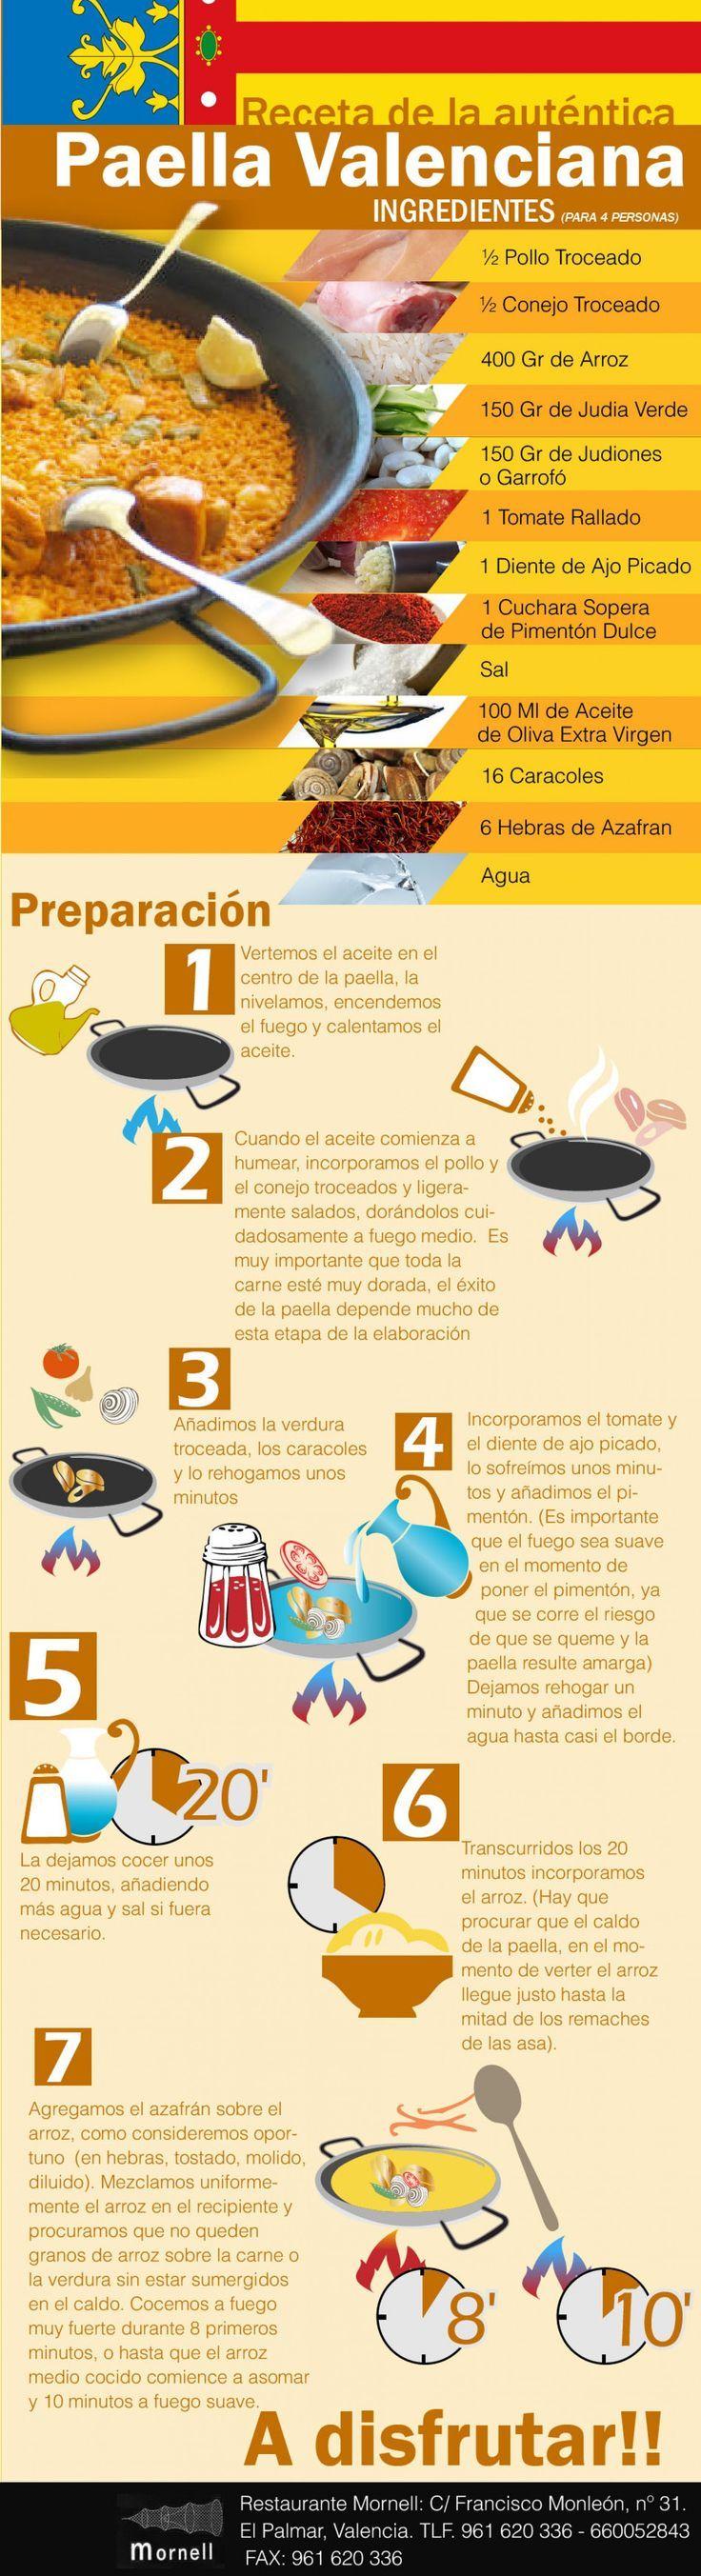 Receta de la auténtica paella valenciana. #recetas #paella #infografia